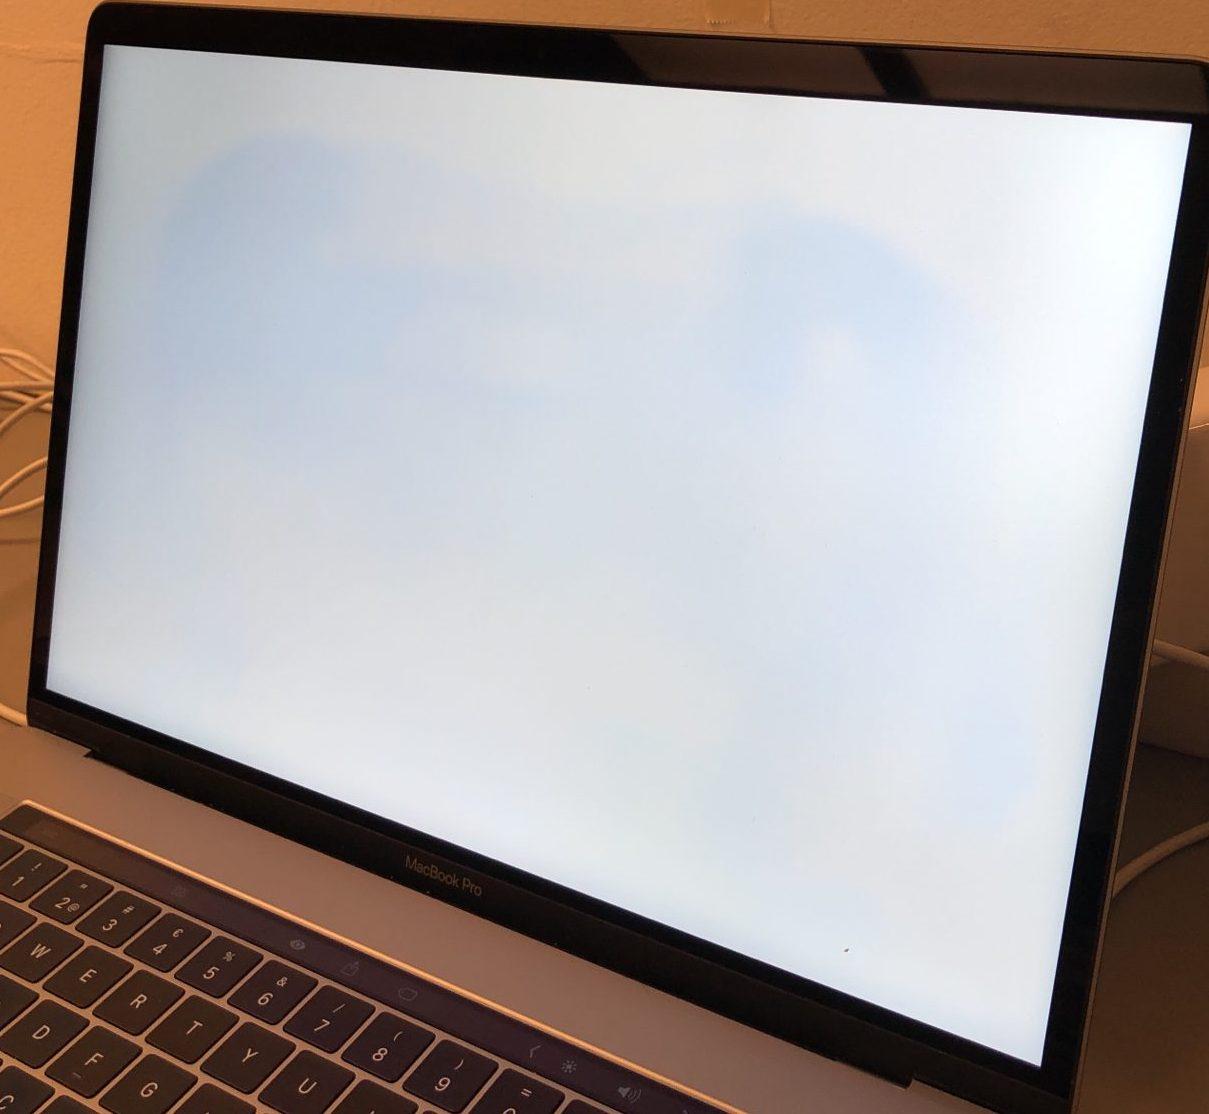 "MacBook Pro 15"" Touch Bar Late 2016 (Intel Quad-Core i7 2.6 GHz 16 GB RAM 512 GB SSD), Space Gray, Intel Quad-Core i7 2.6 GHz, 16 GB RAM, 512 GB SSD, Kuva 4"